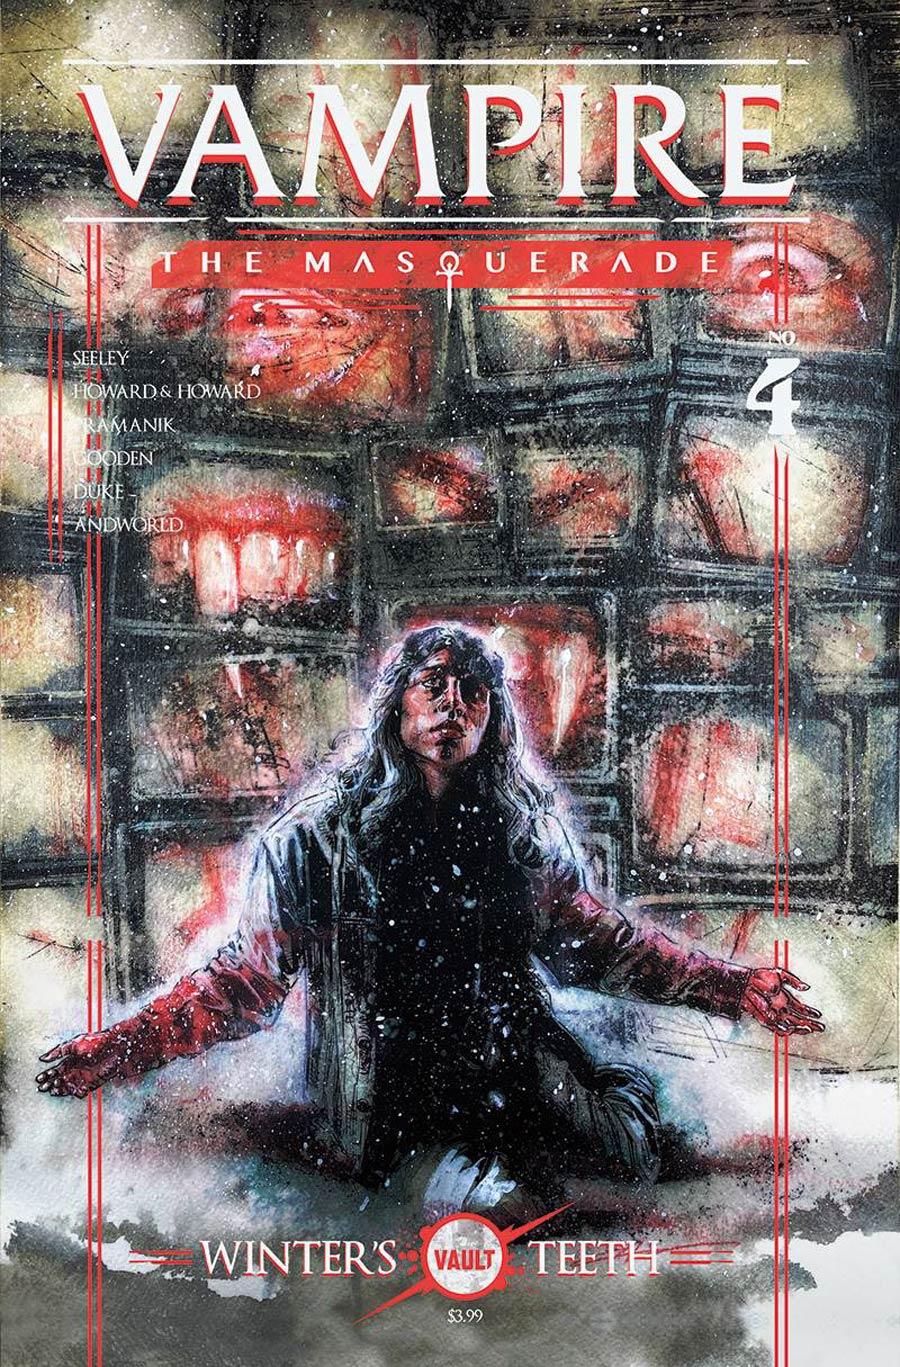 Vampire The Masquerade #4 Cover A Regular Aaron Campbell Cover